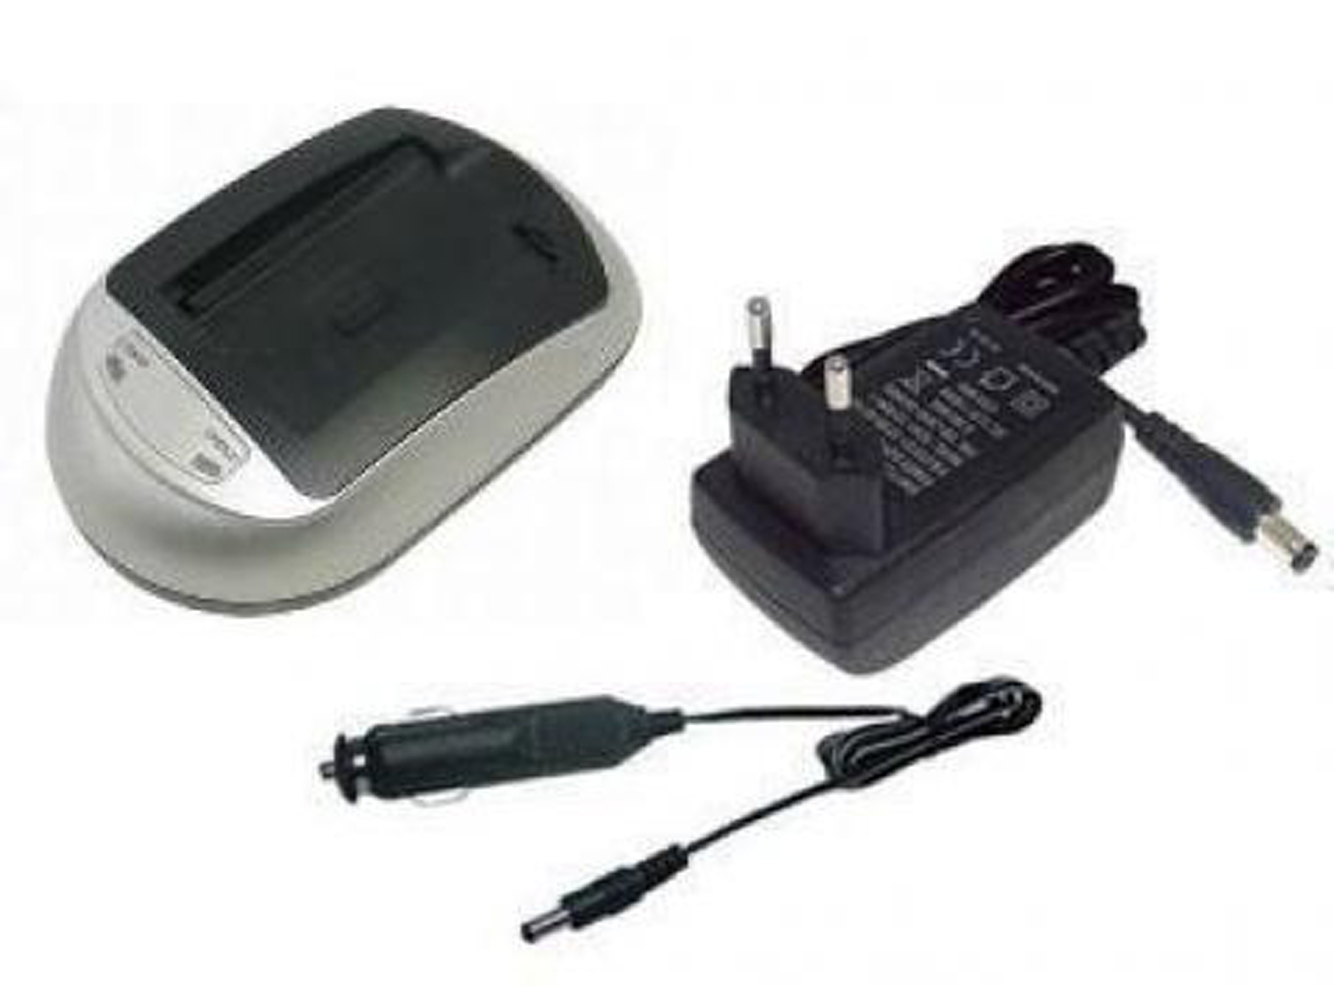 Battery Charger for PANASONIC CGA-S003, CGA-S003A/1B, CGA-S003E/1B, VW-VBA05